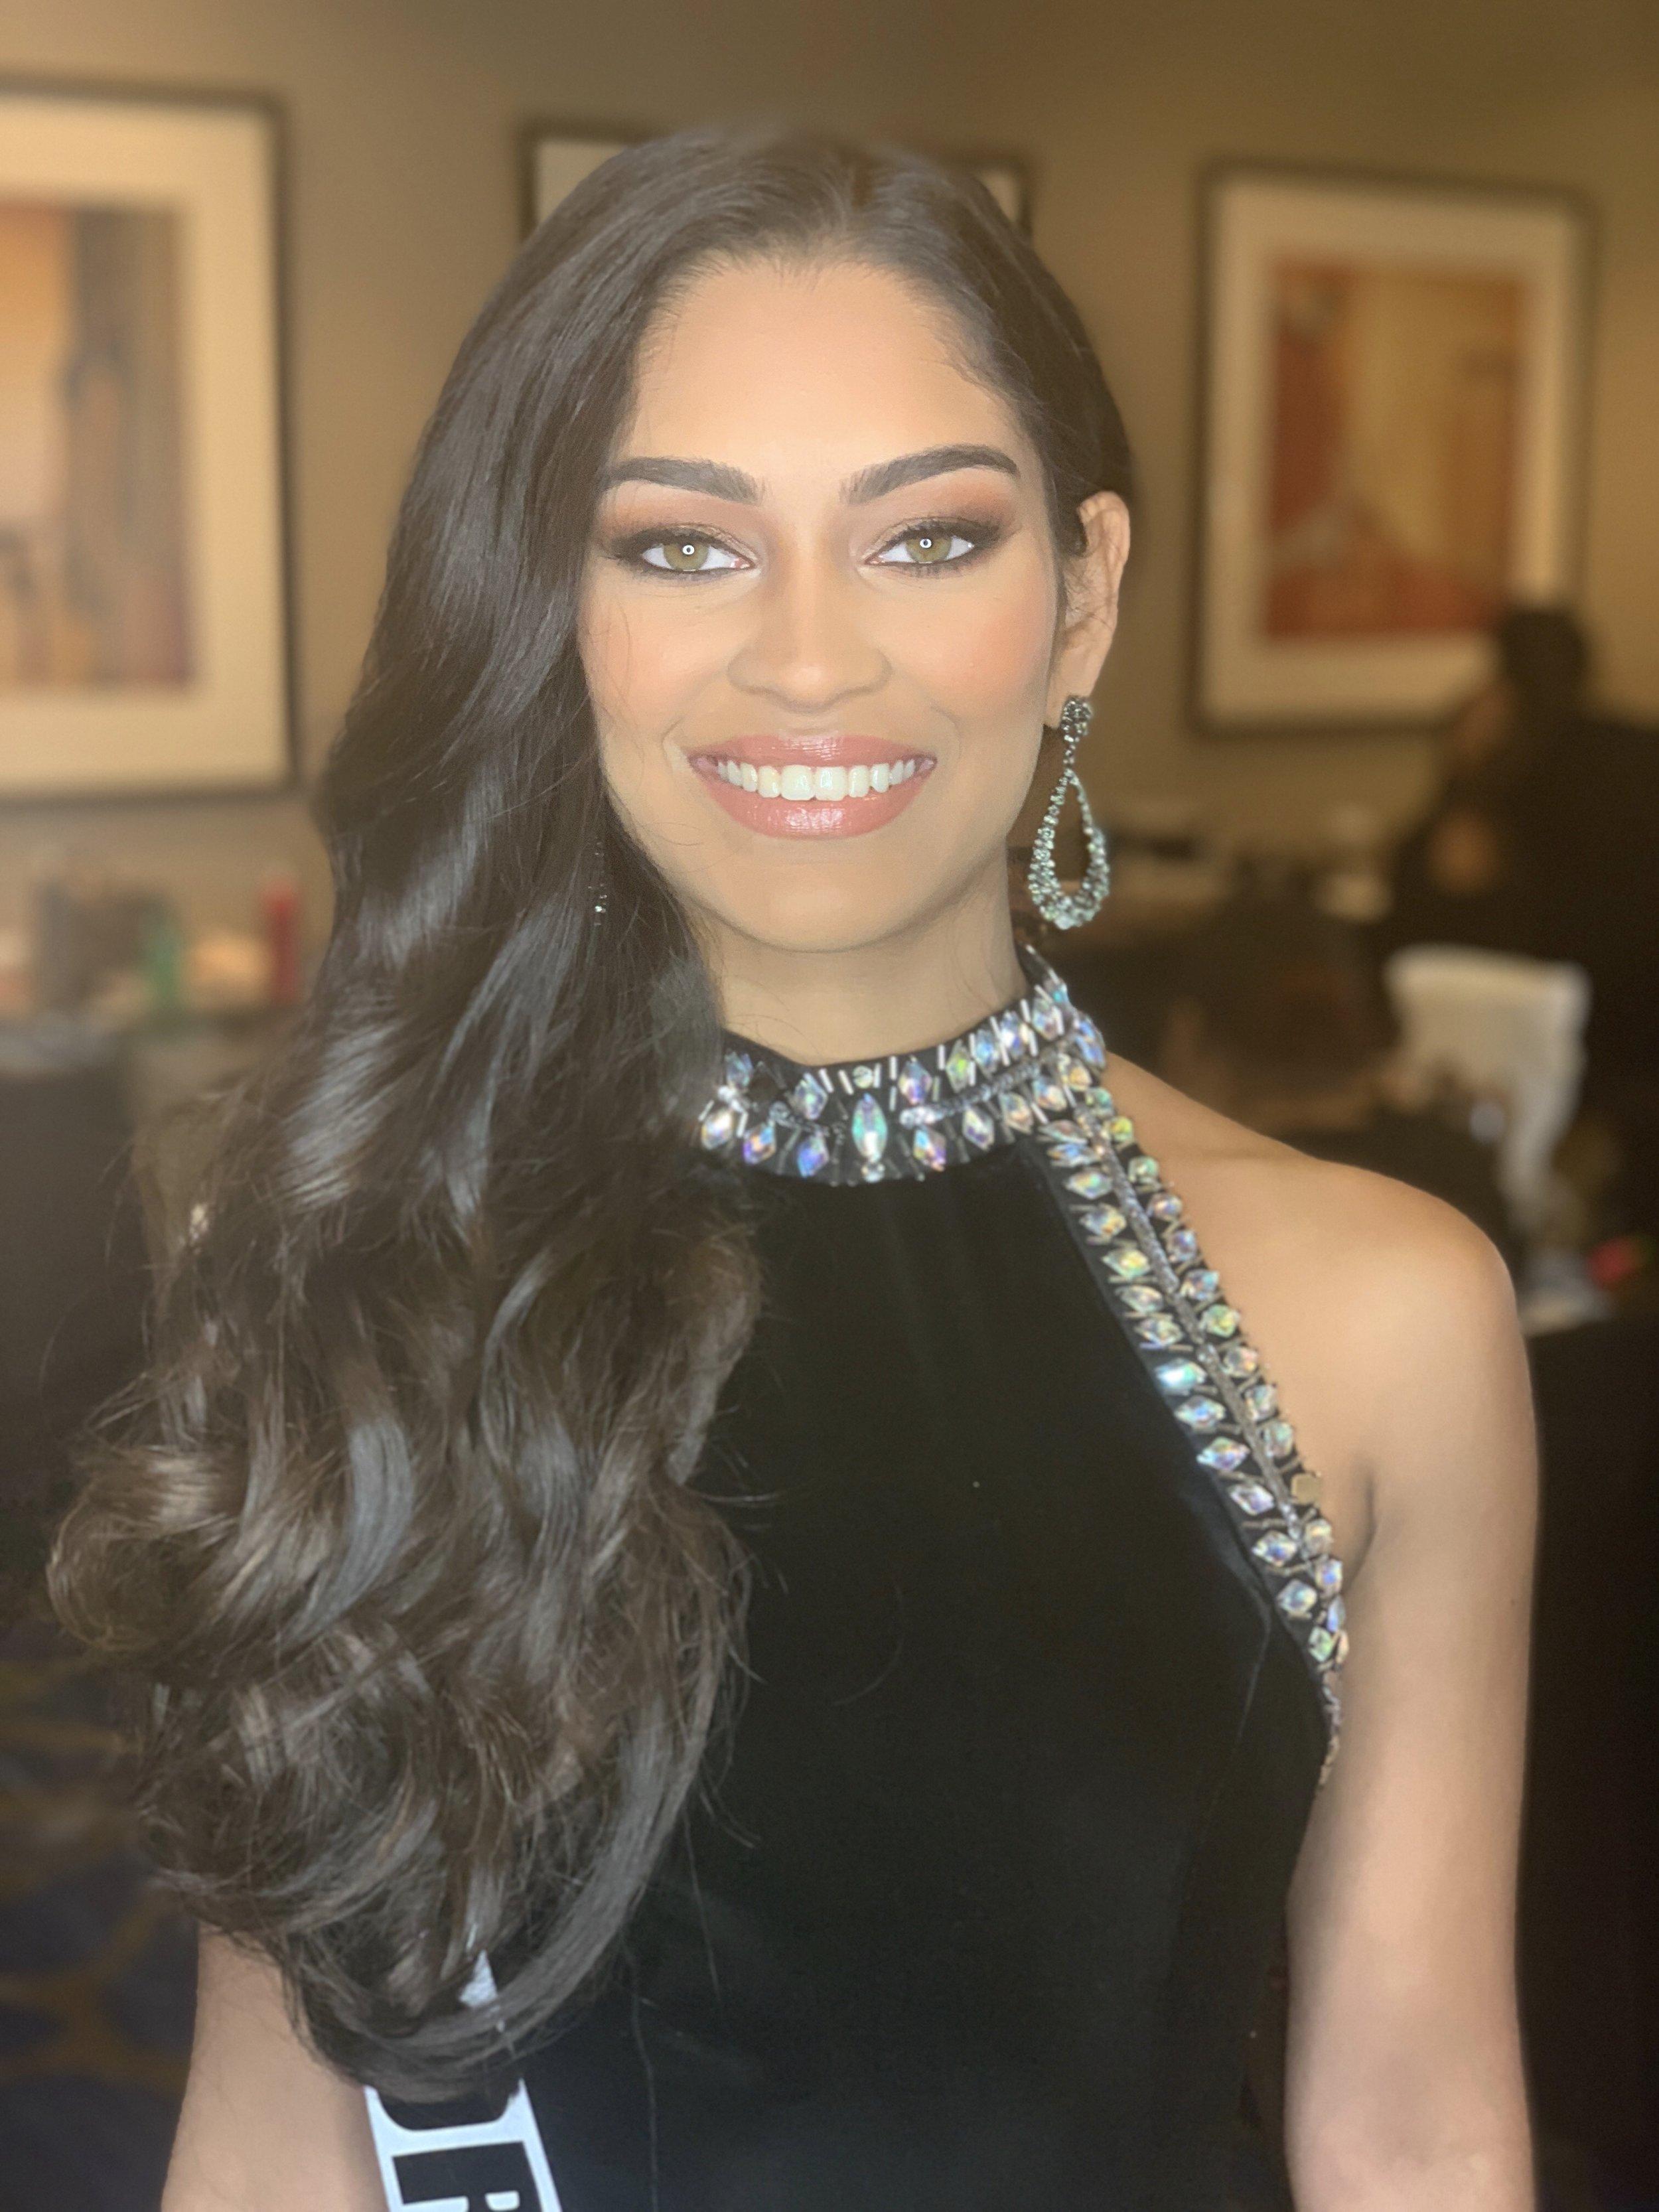 Miss-NJ-USA-2019.jpg